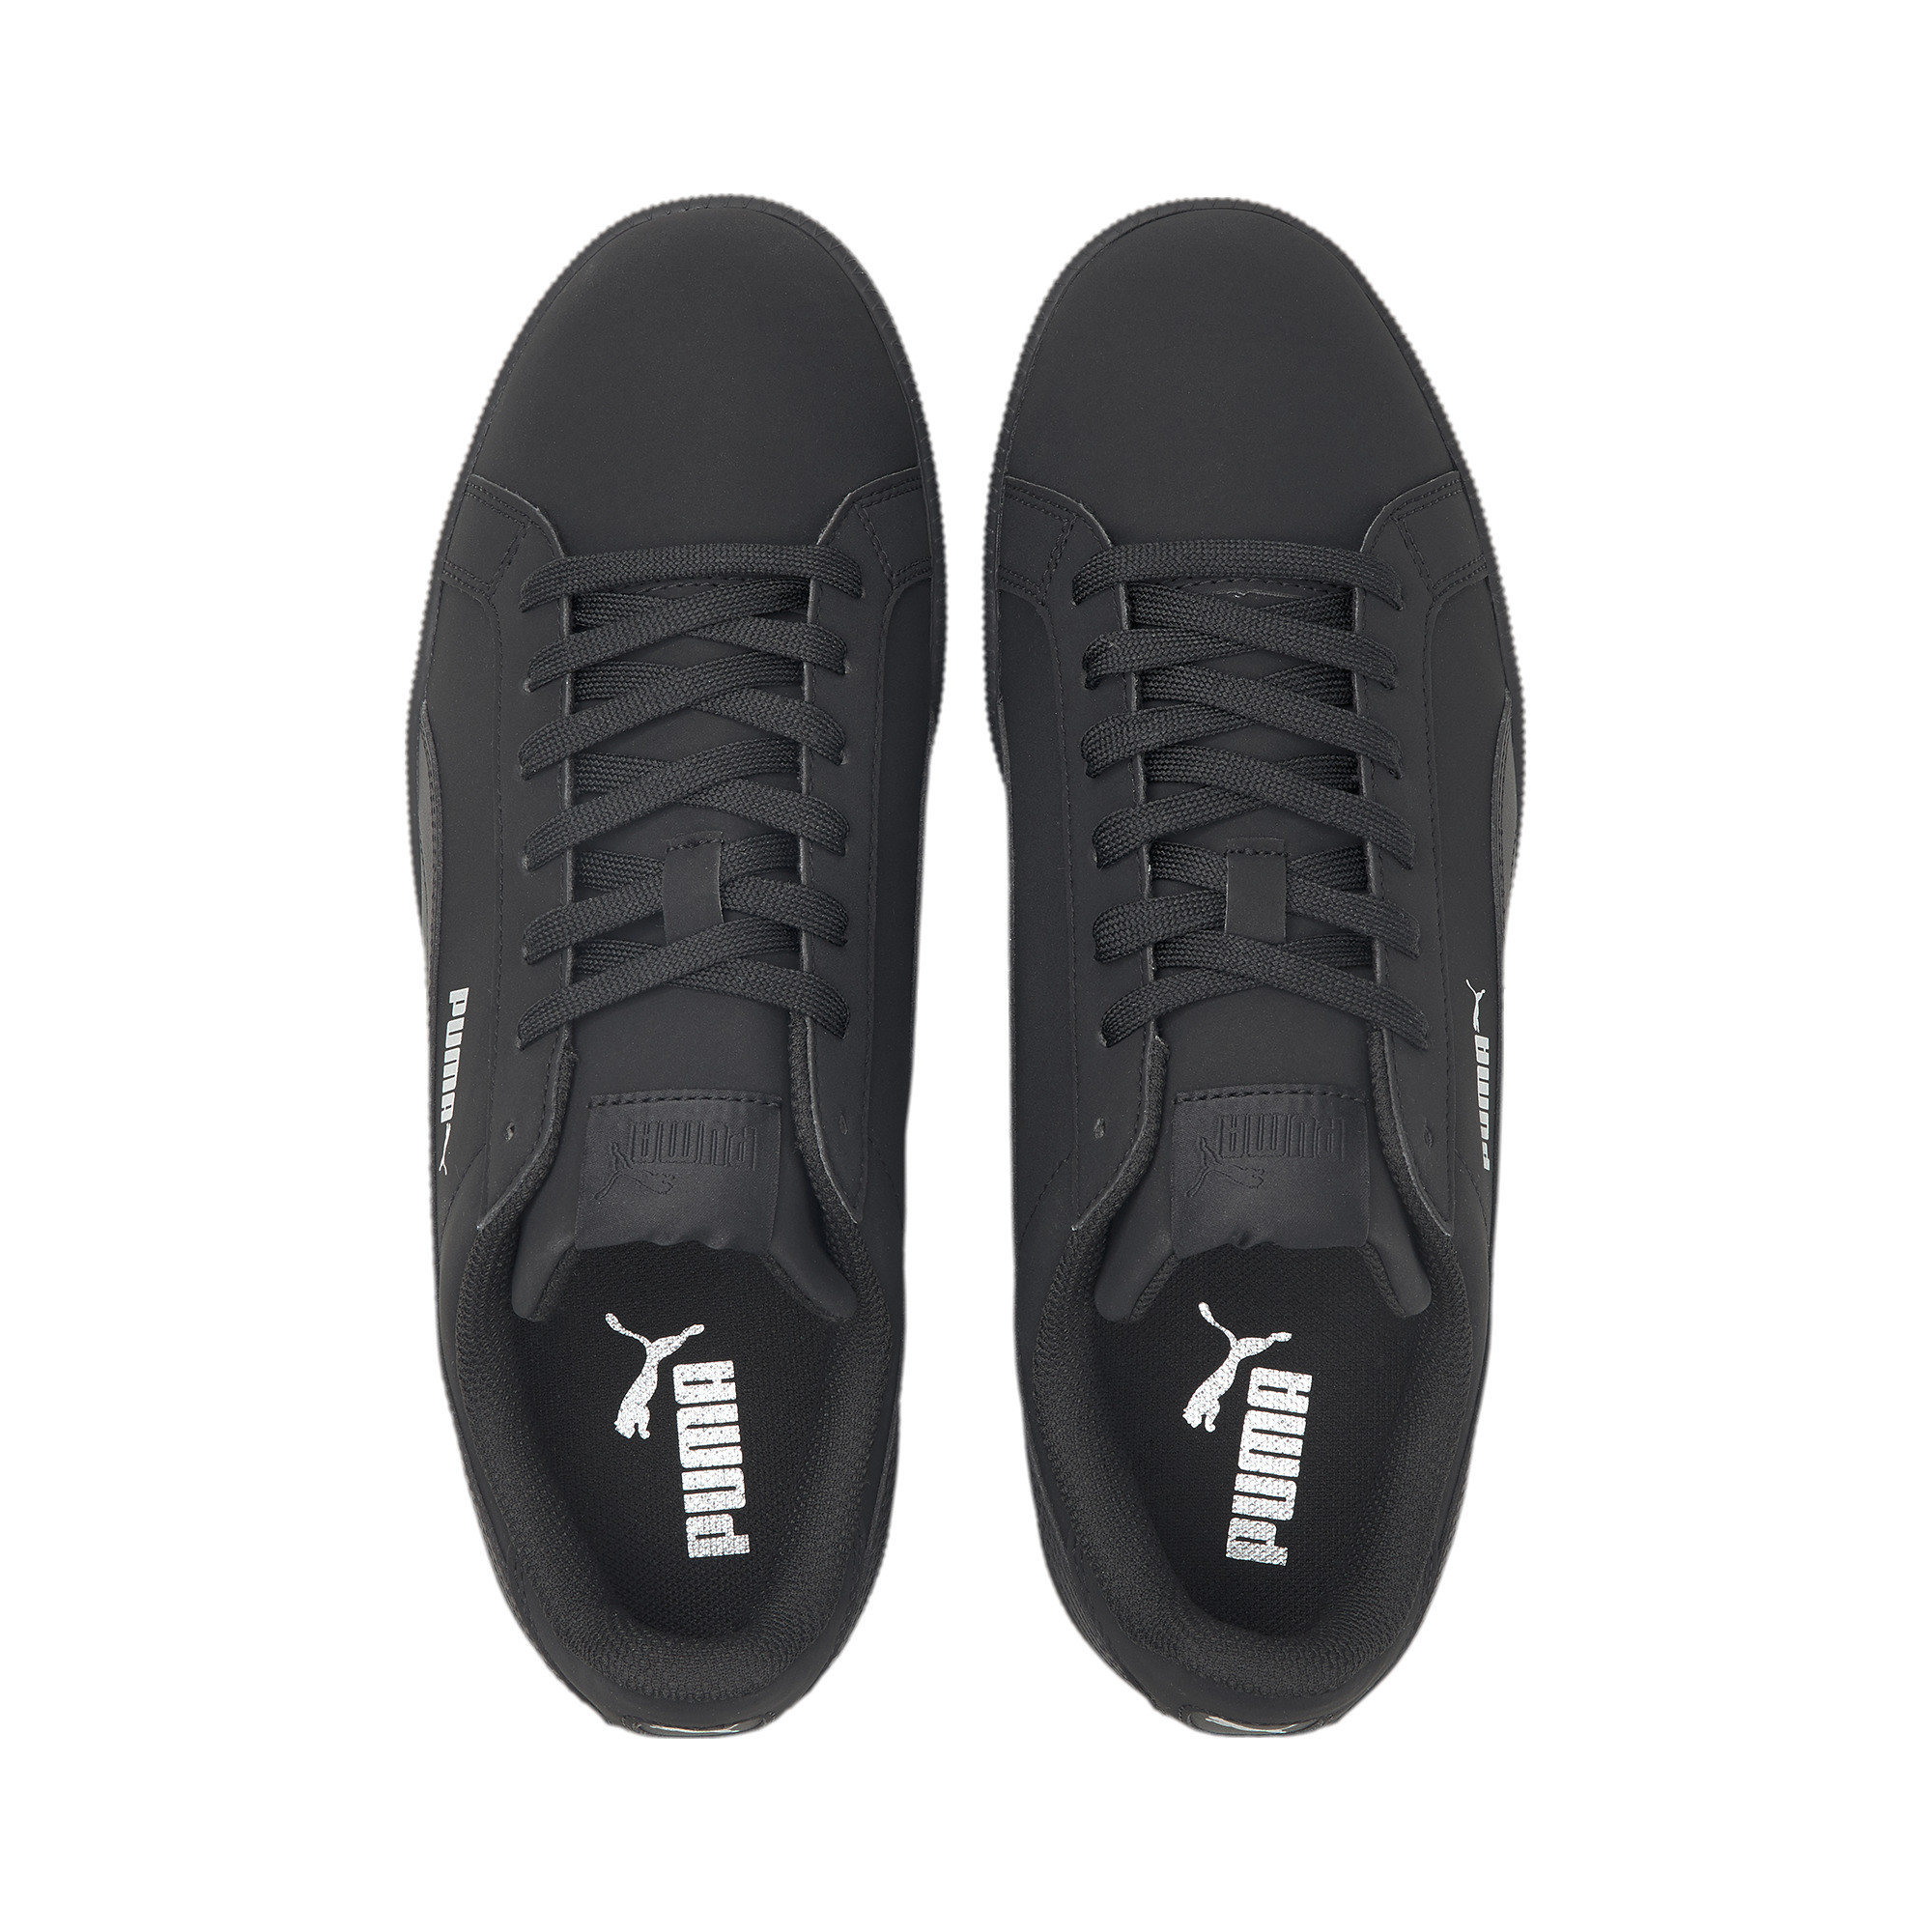 Indexbild 12 - PUMA Smash Buck Sneaker Unisex Schuhe Sport Classics Neu